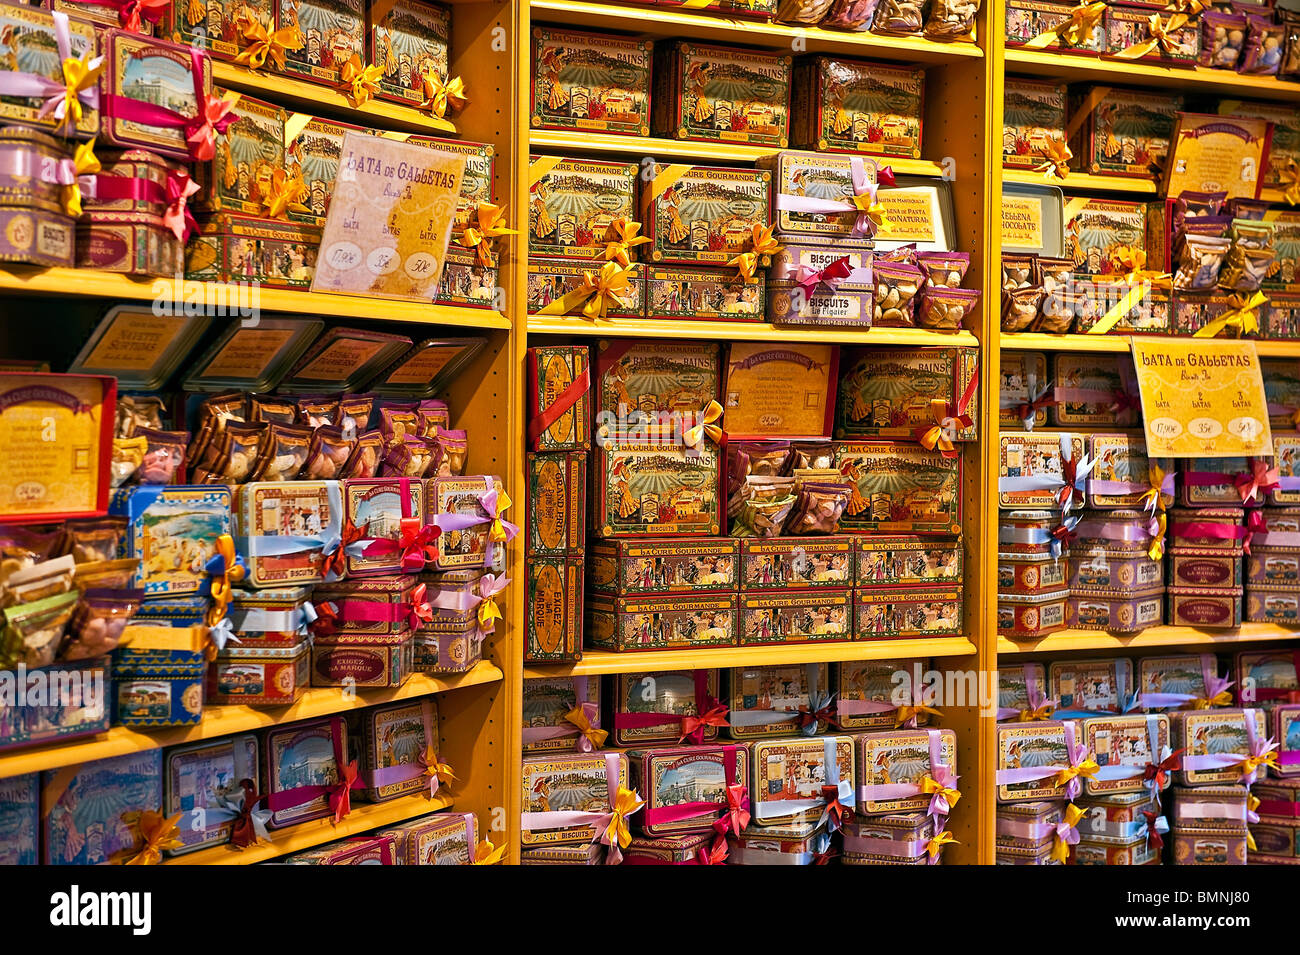 La Cure Gourmande, Madrid, Spanien Stockbild